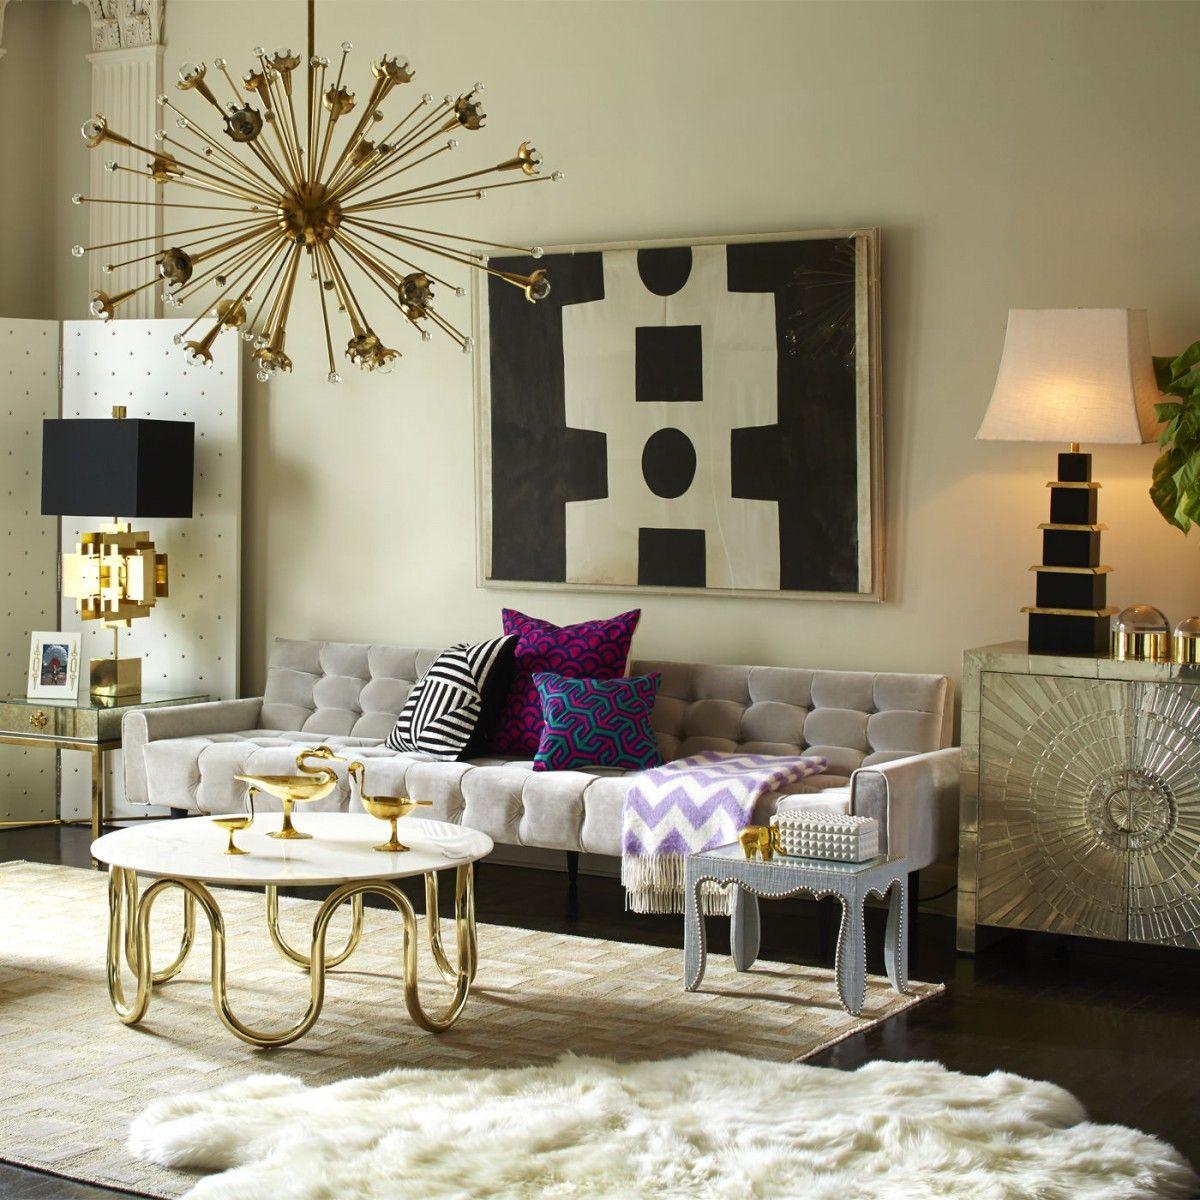 Living Room Ideas · Sophisticated Modern Interior By Jonathan Adler ...